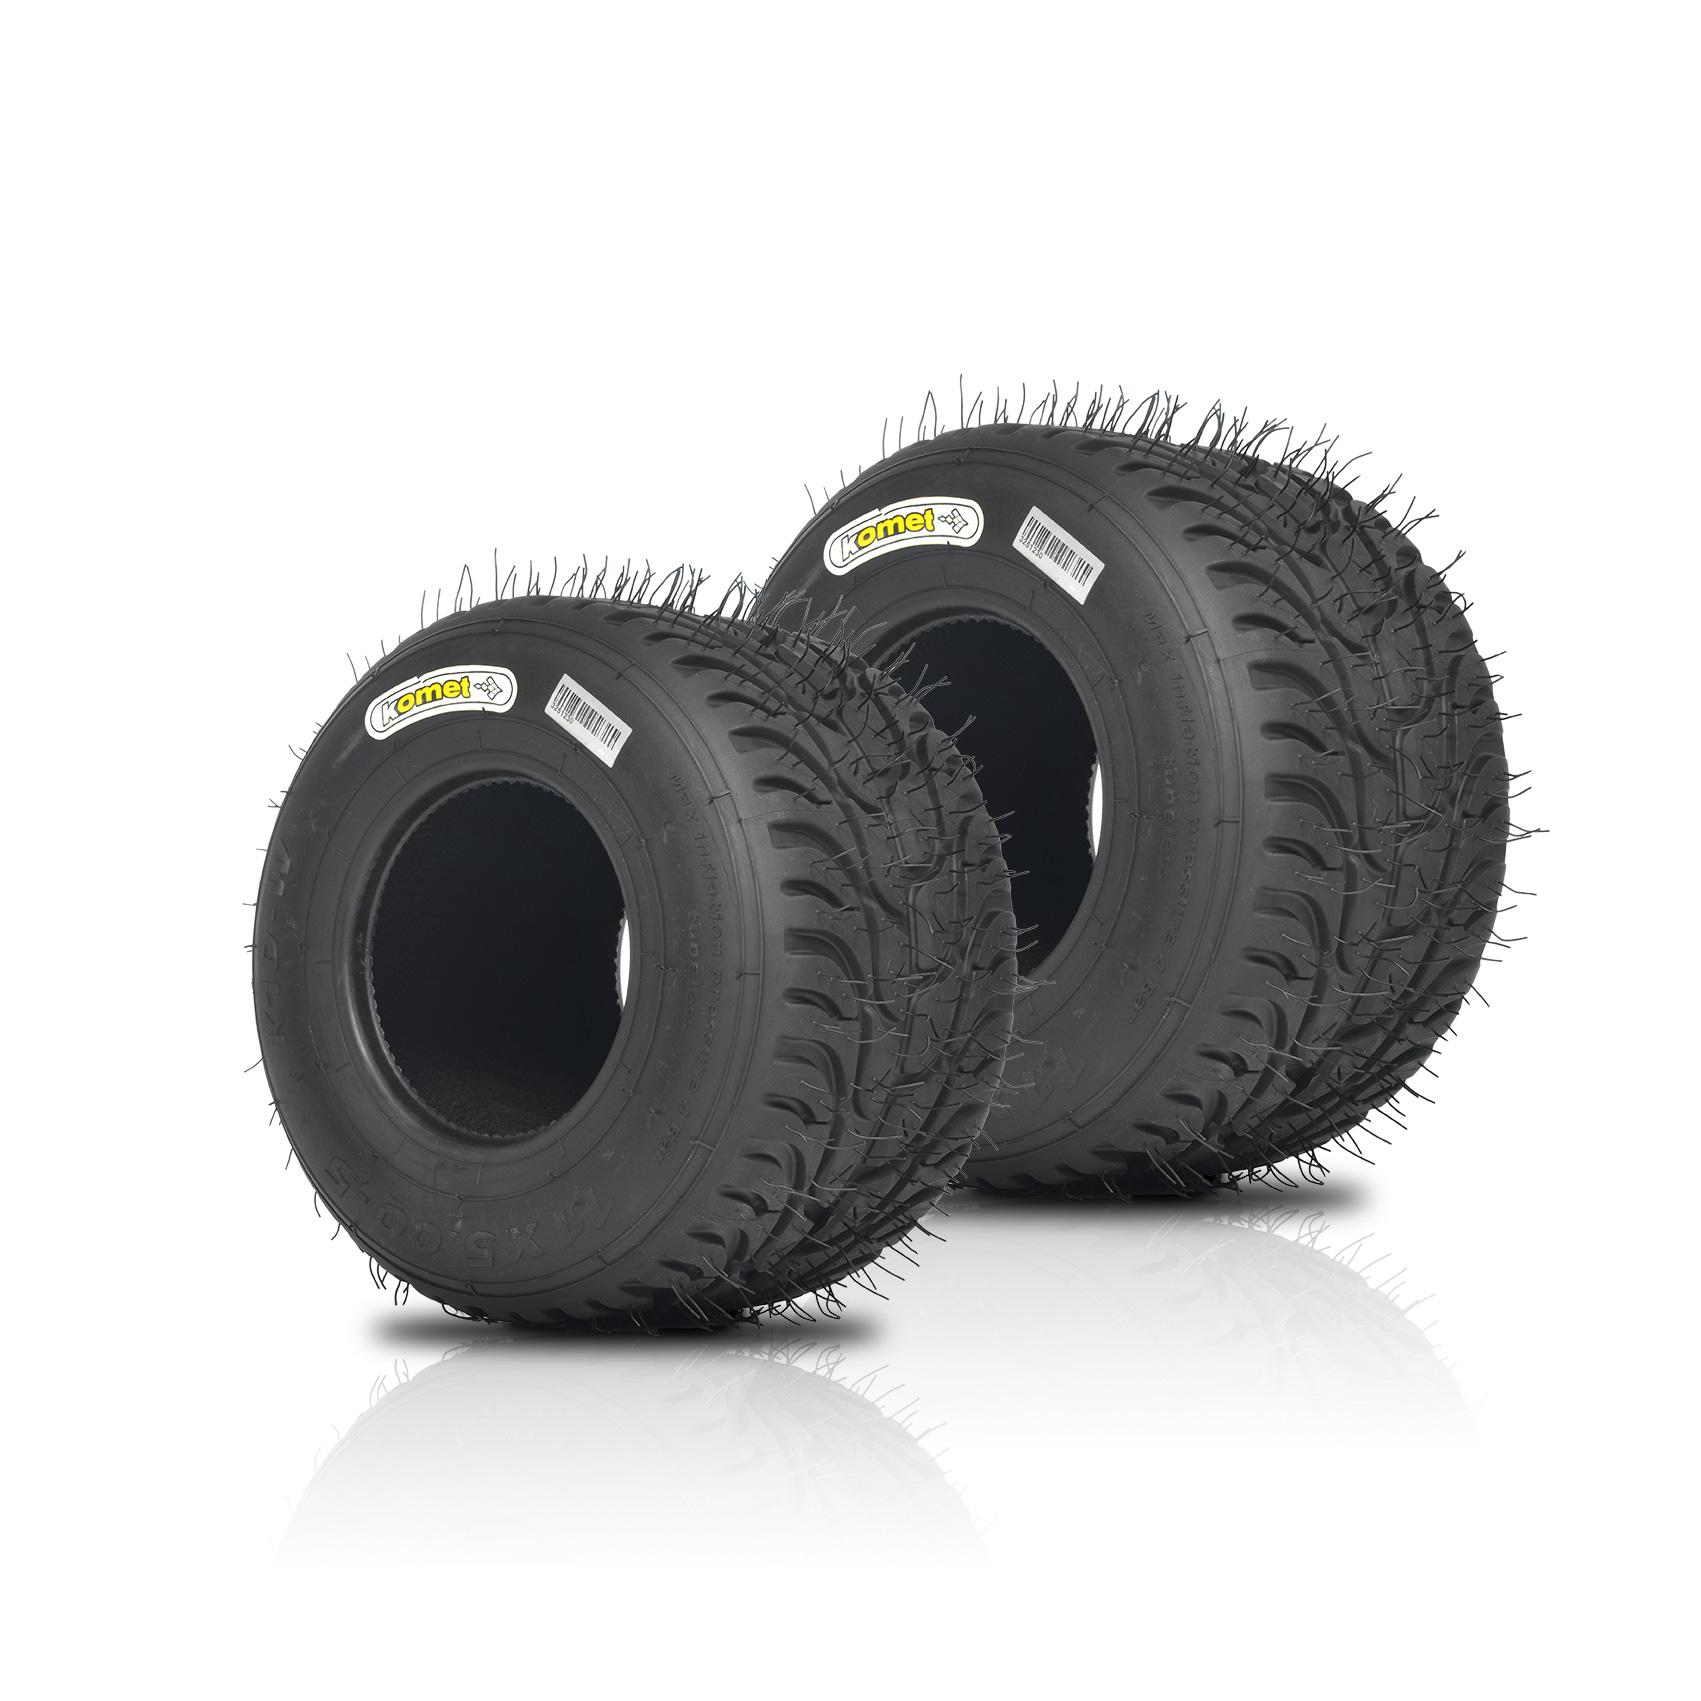 IAME KARTING | Komet Racing Tyres k1D-W